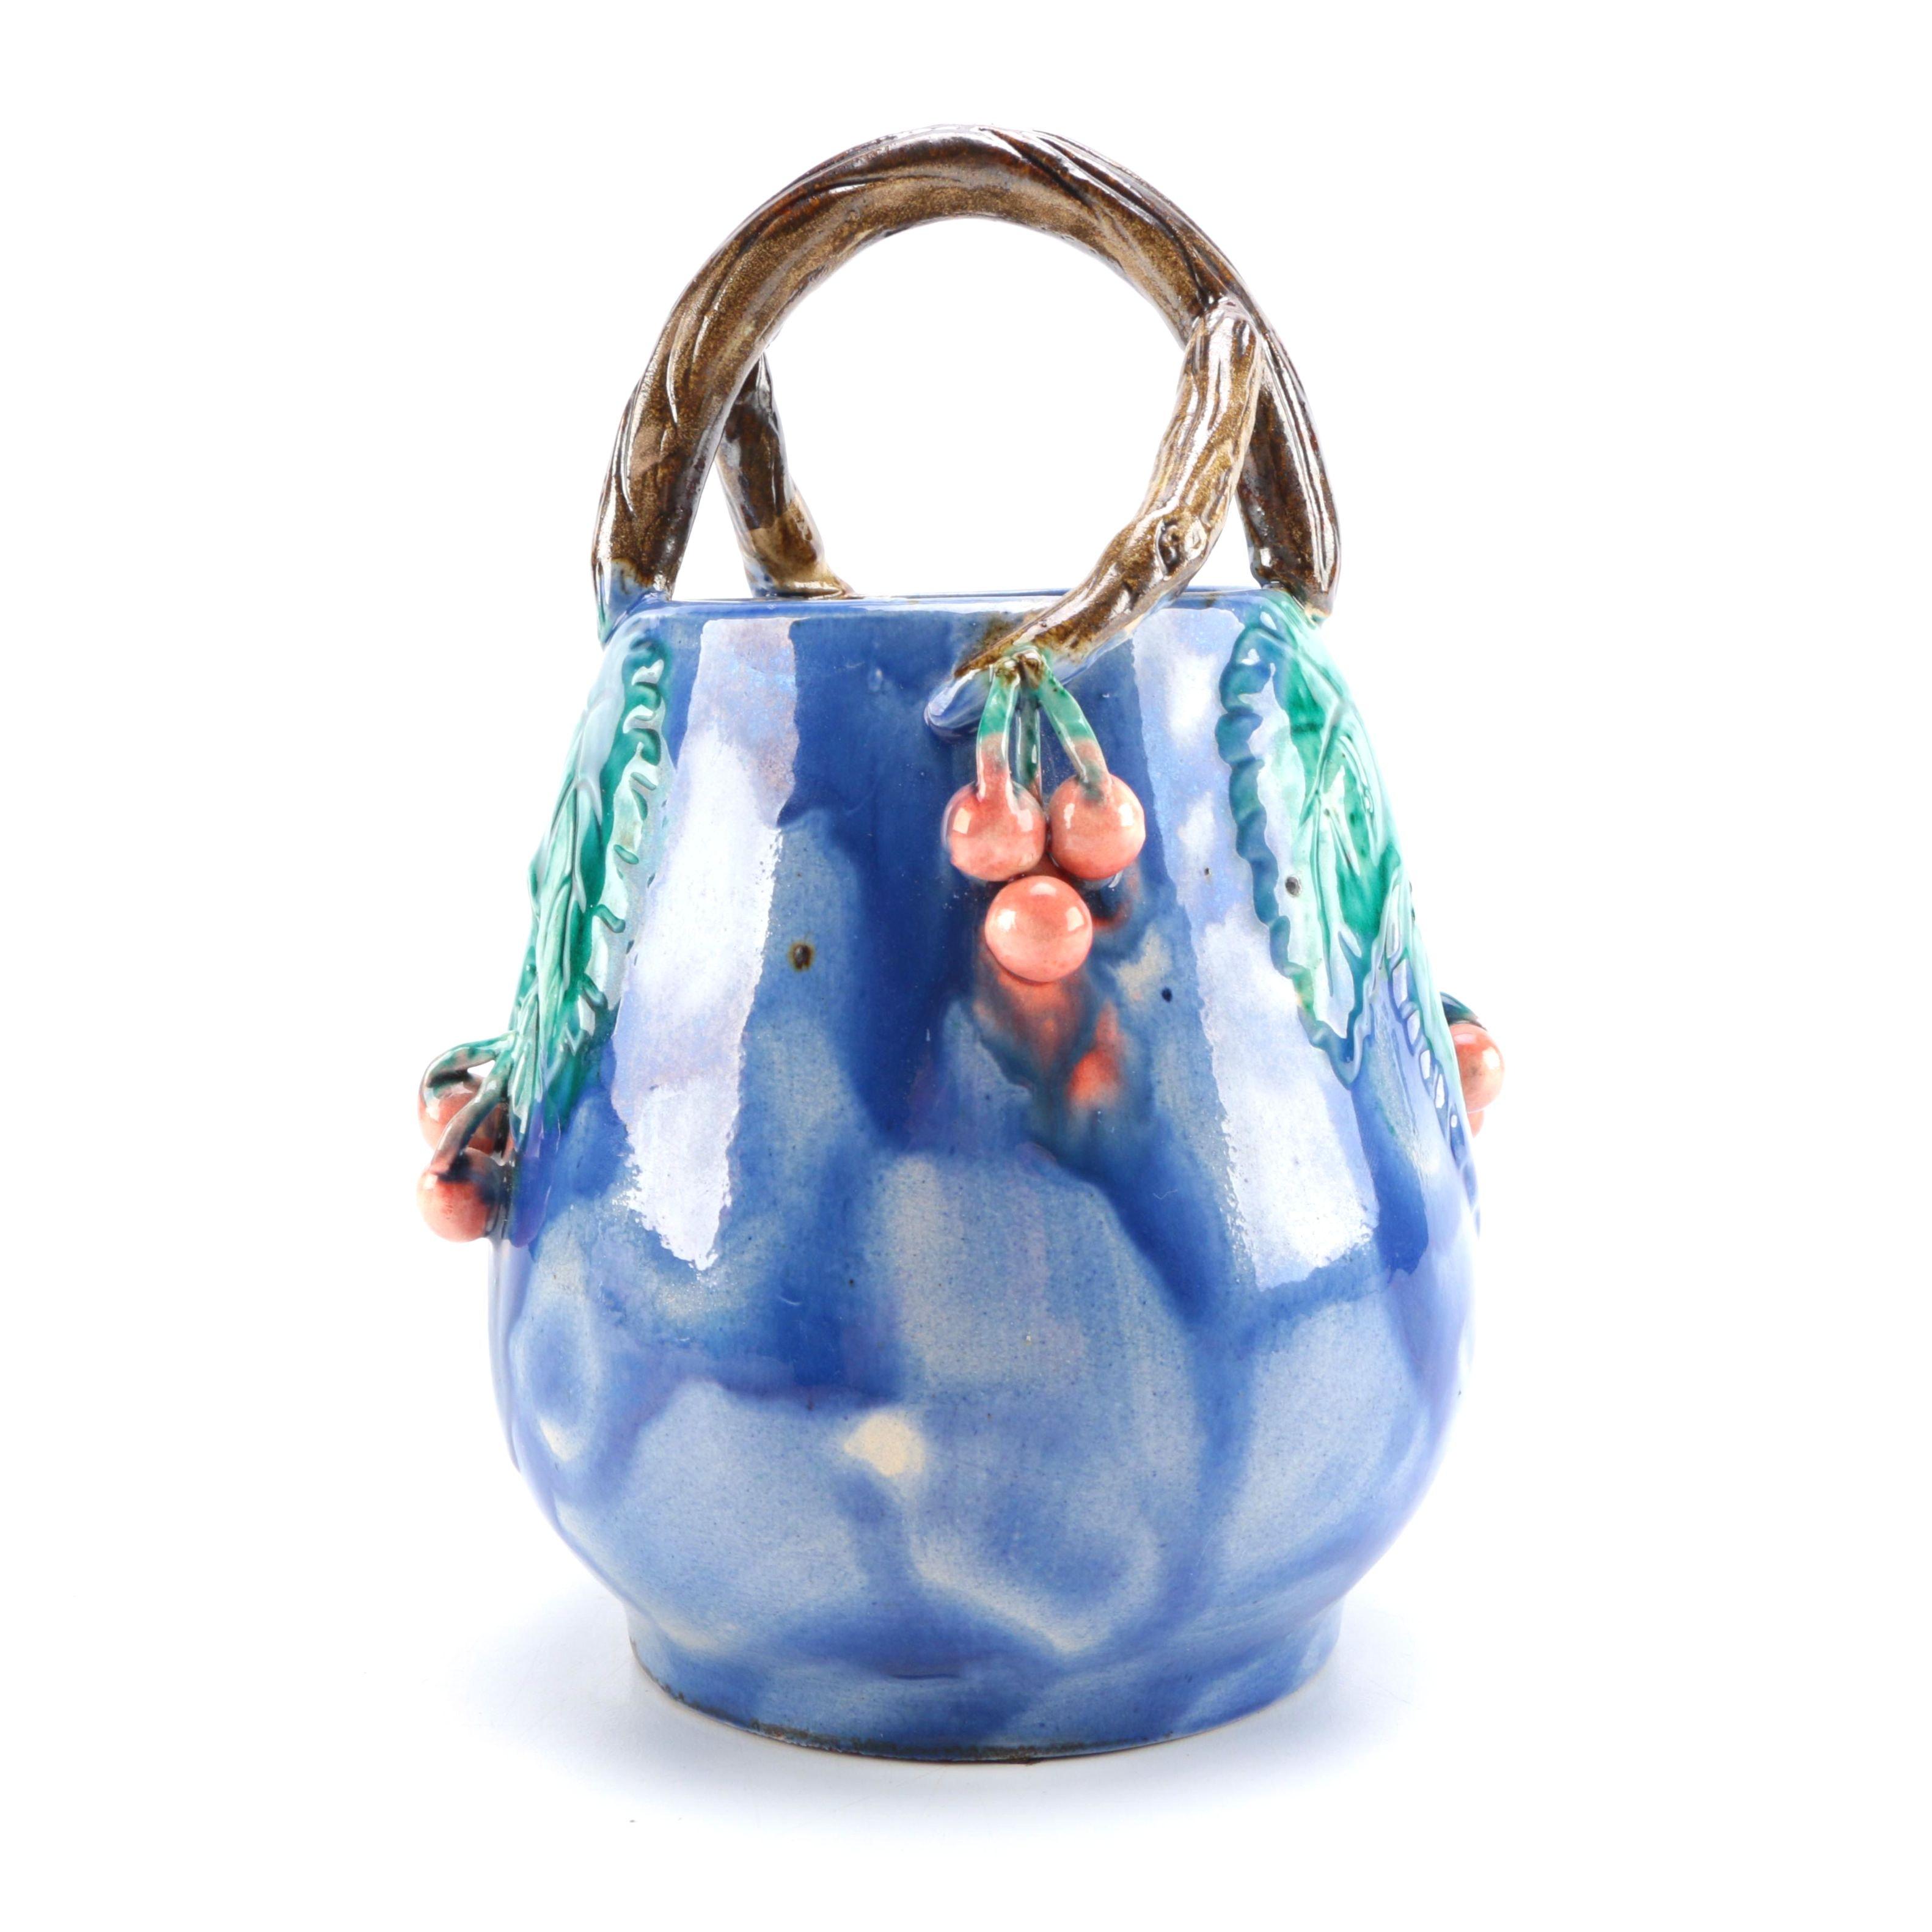 Decorative Blue Ceramic Basket